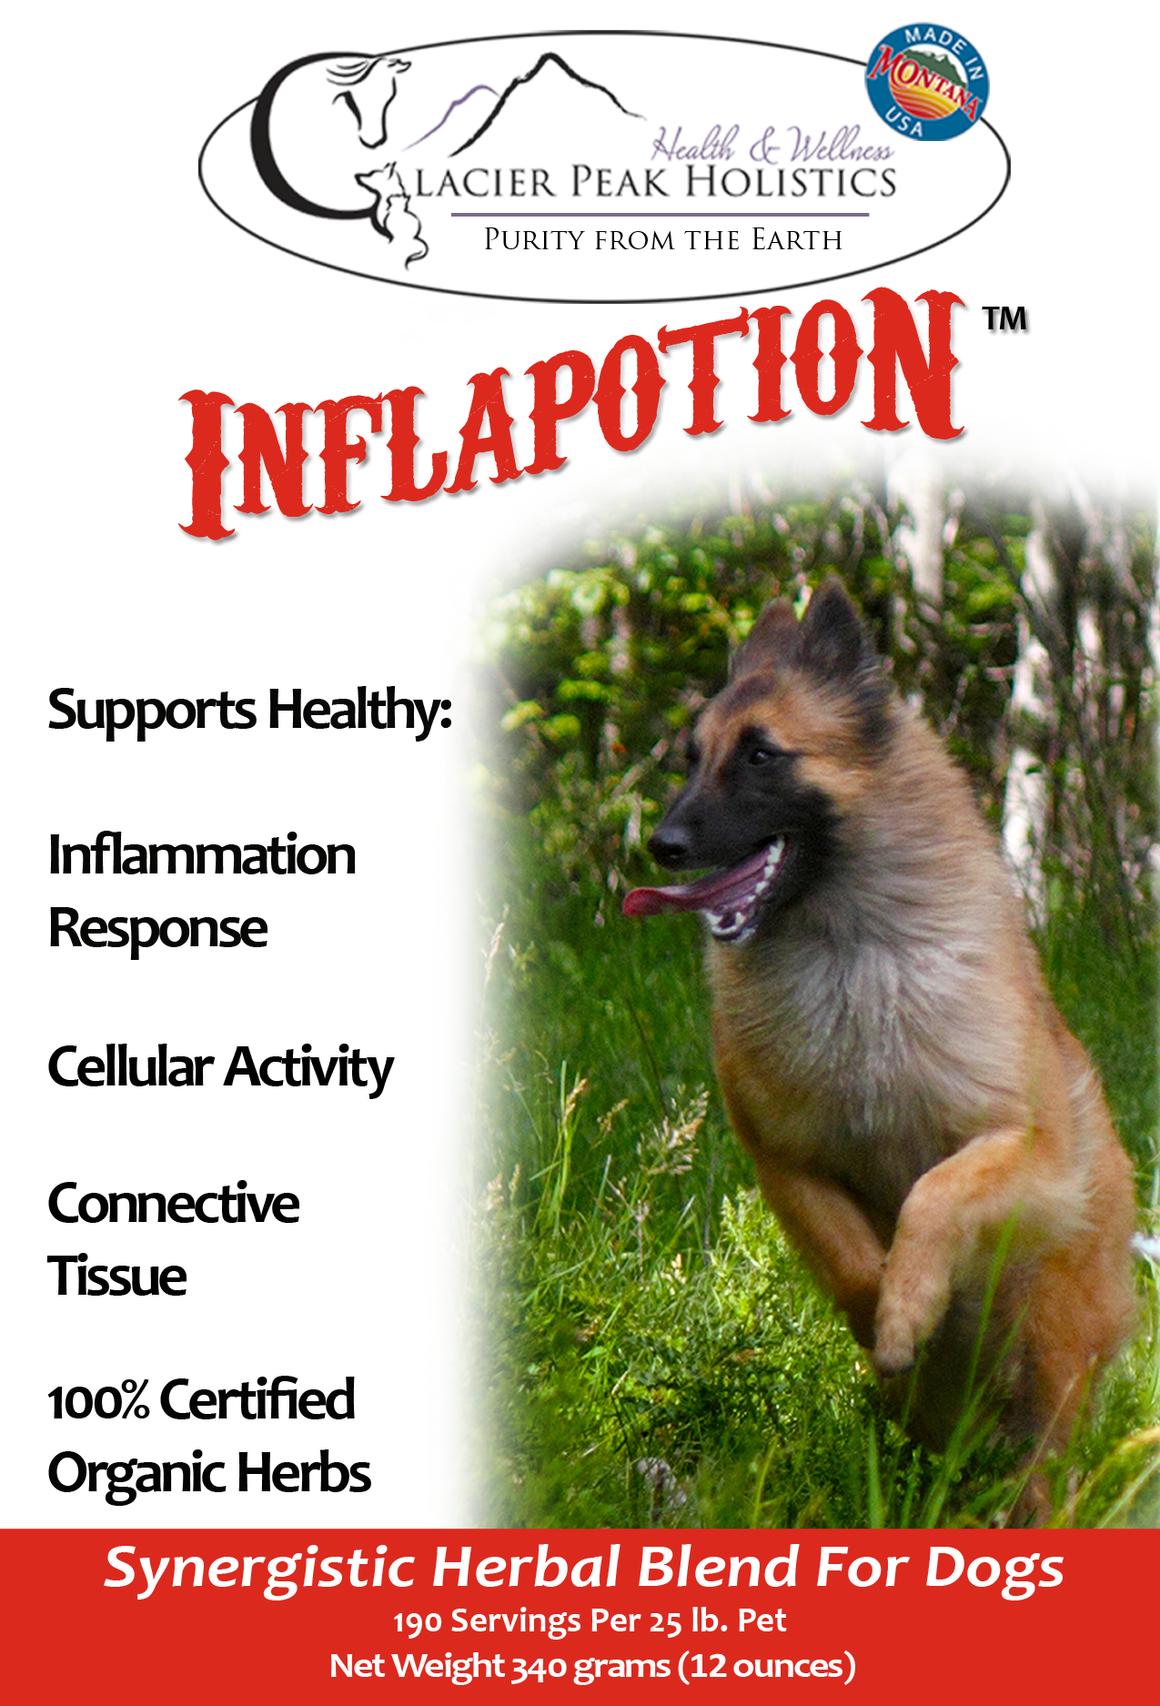 Glacier Peak Holistics Inflapotion Powder Dog Supplement, 12-oz